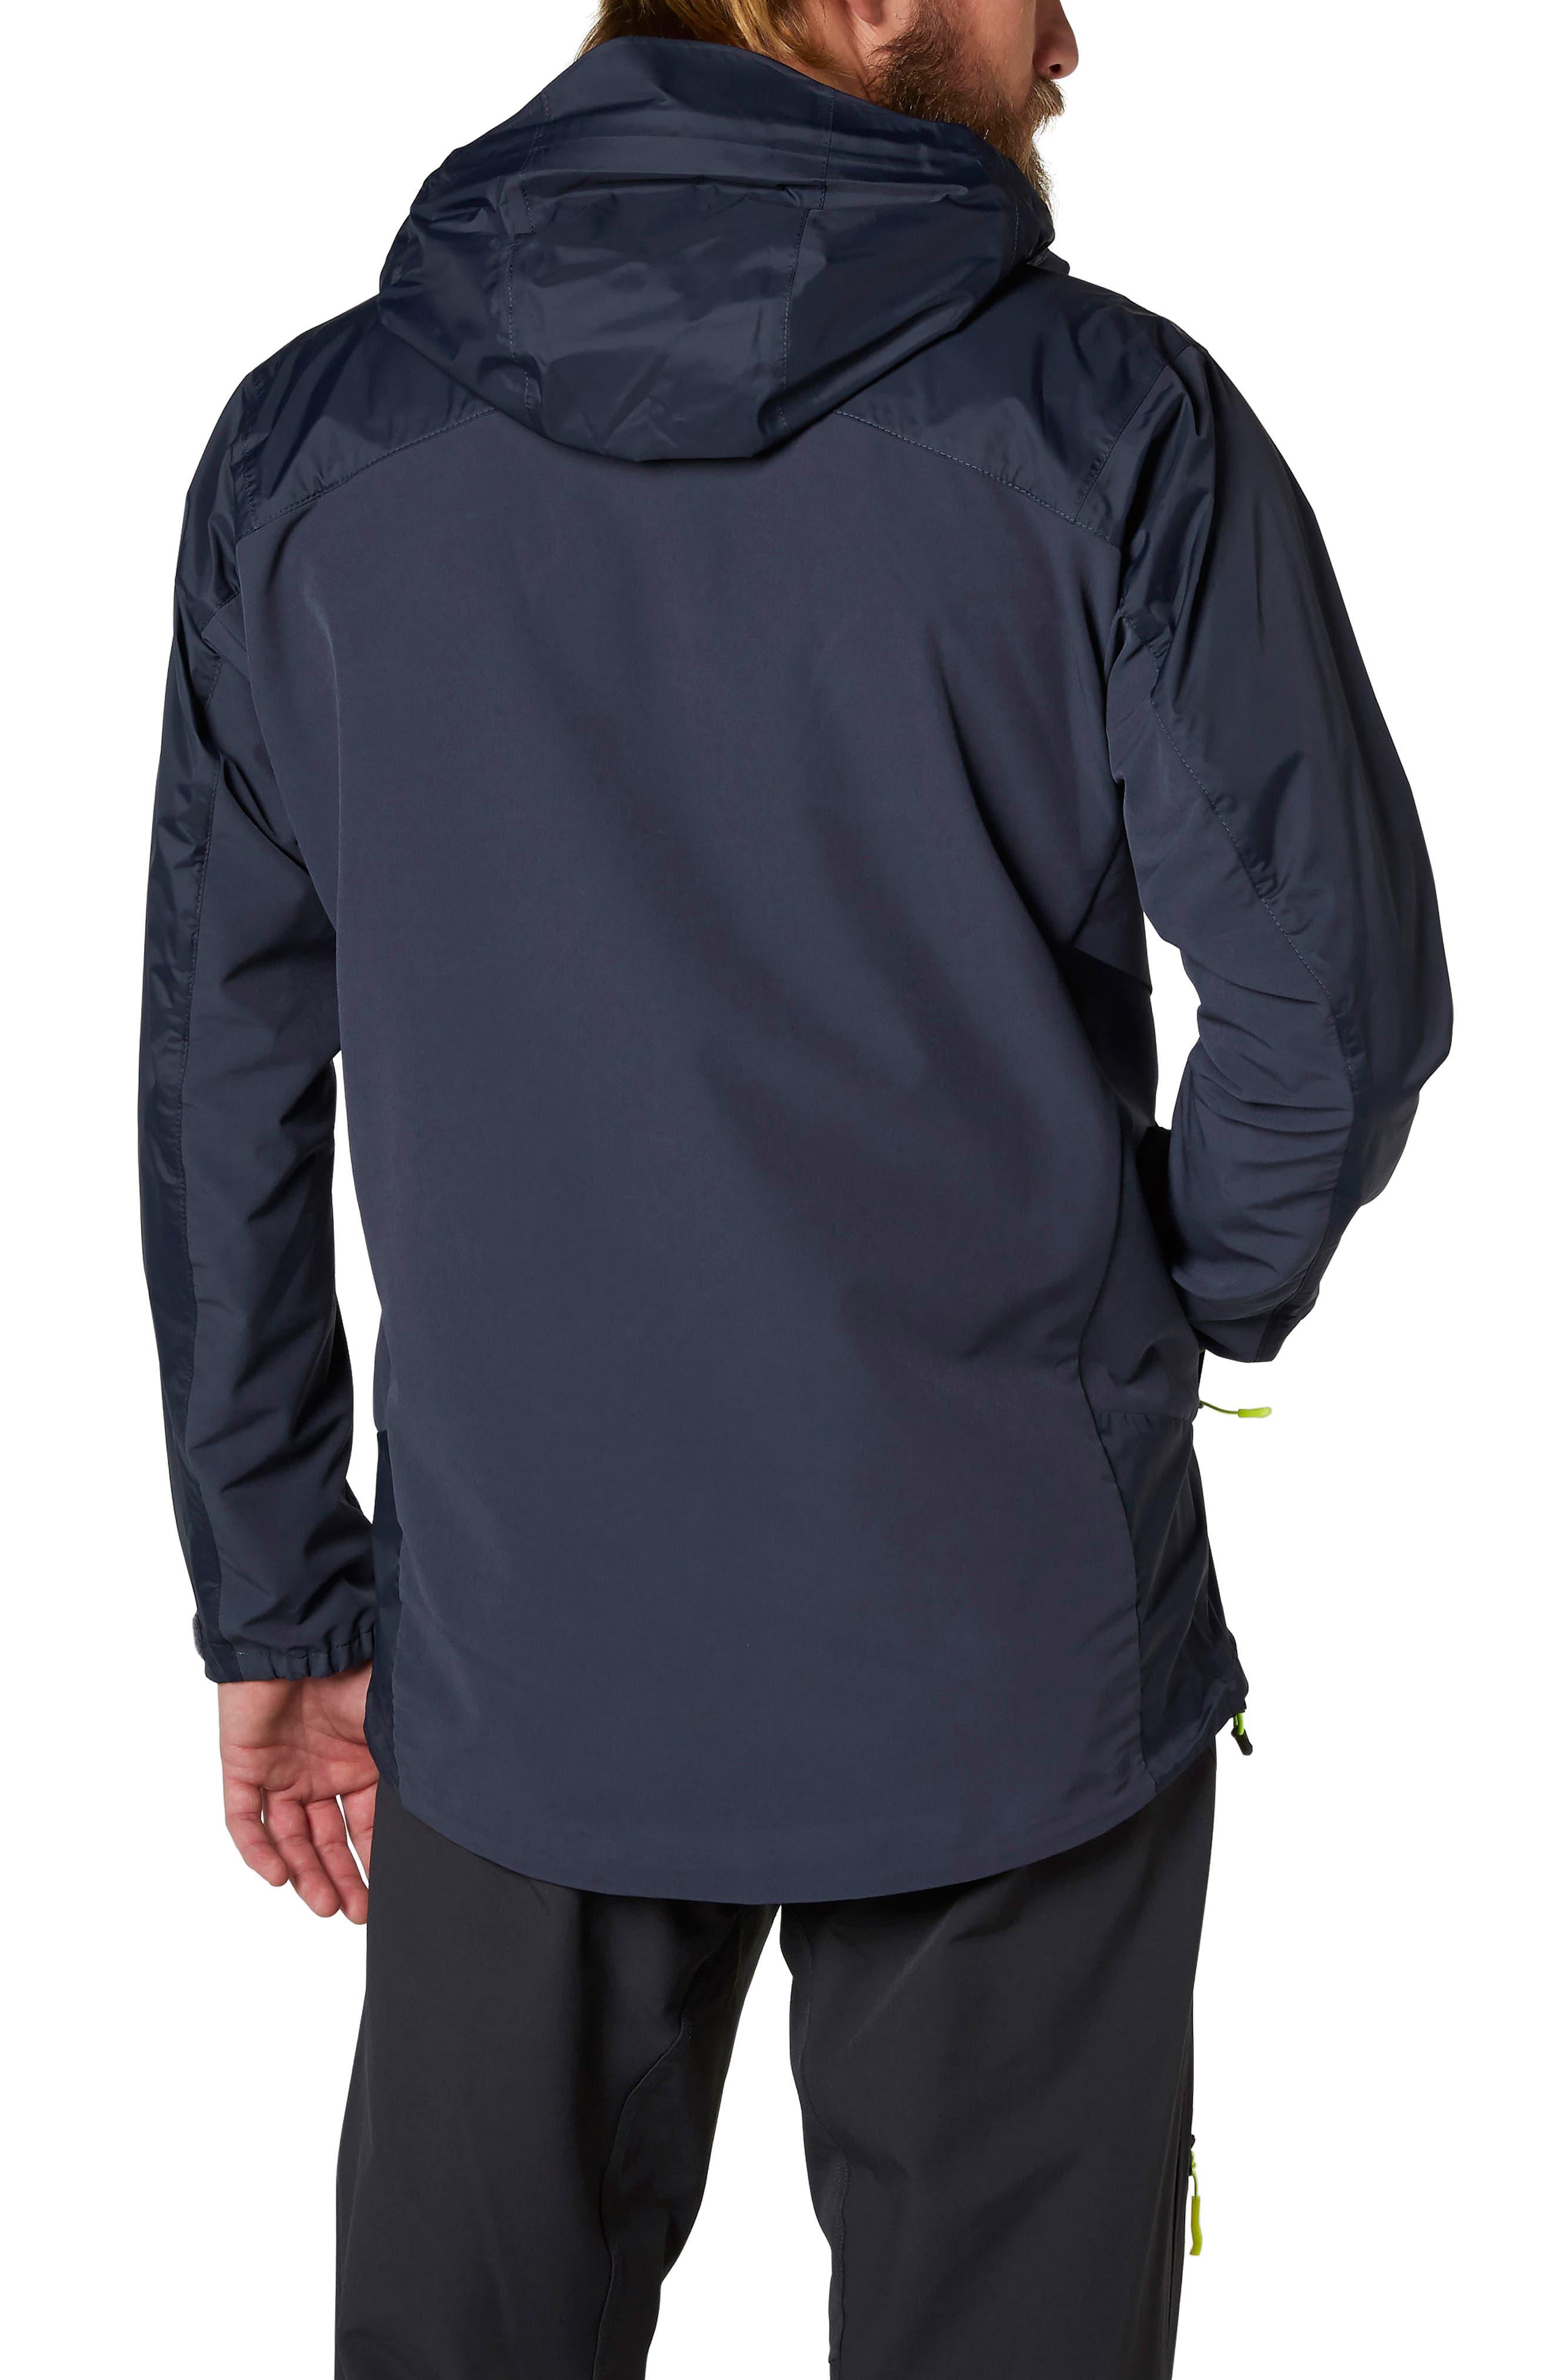 Vanir Logr Regular Fit Waterproof Jacket,                             Alternate thumbnail 2, color,                             Graphite Blue